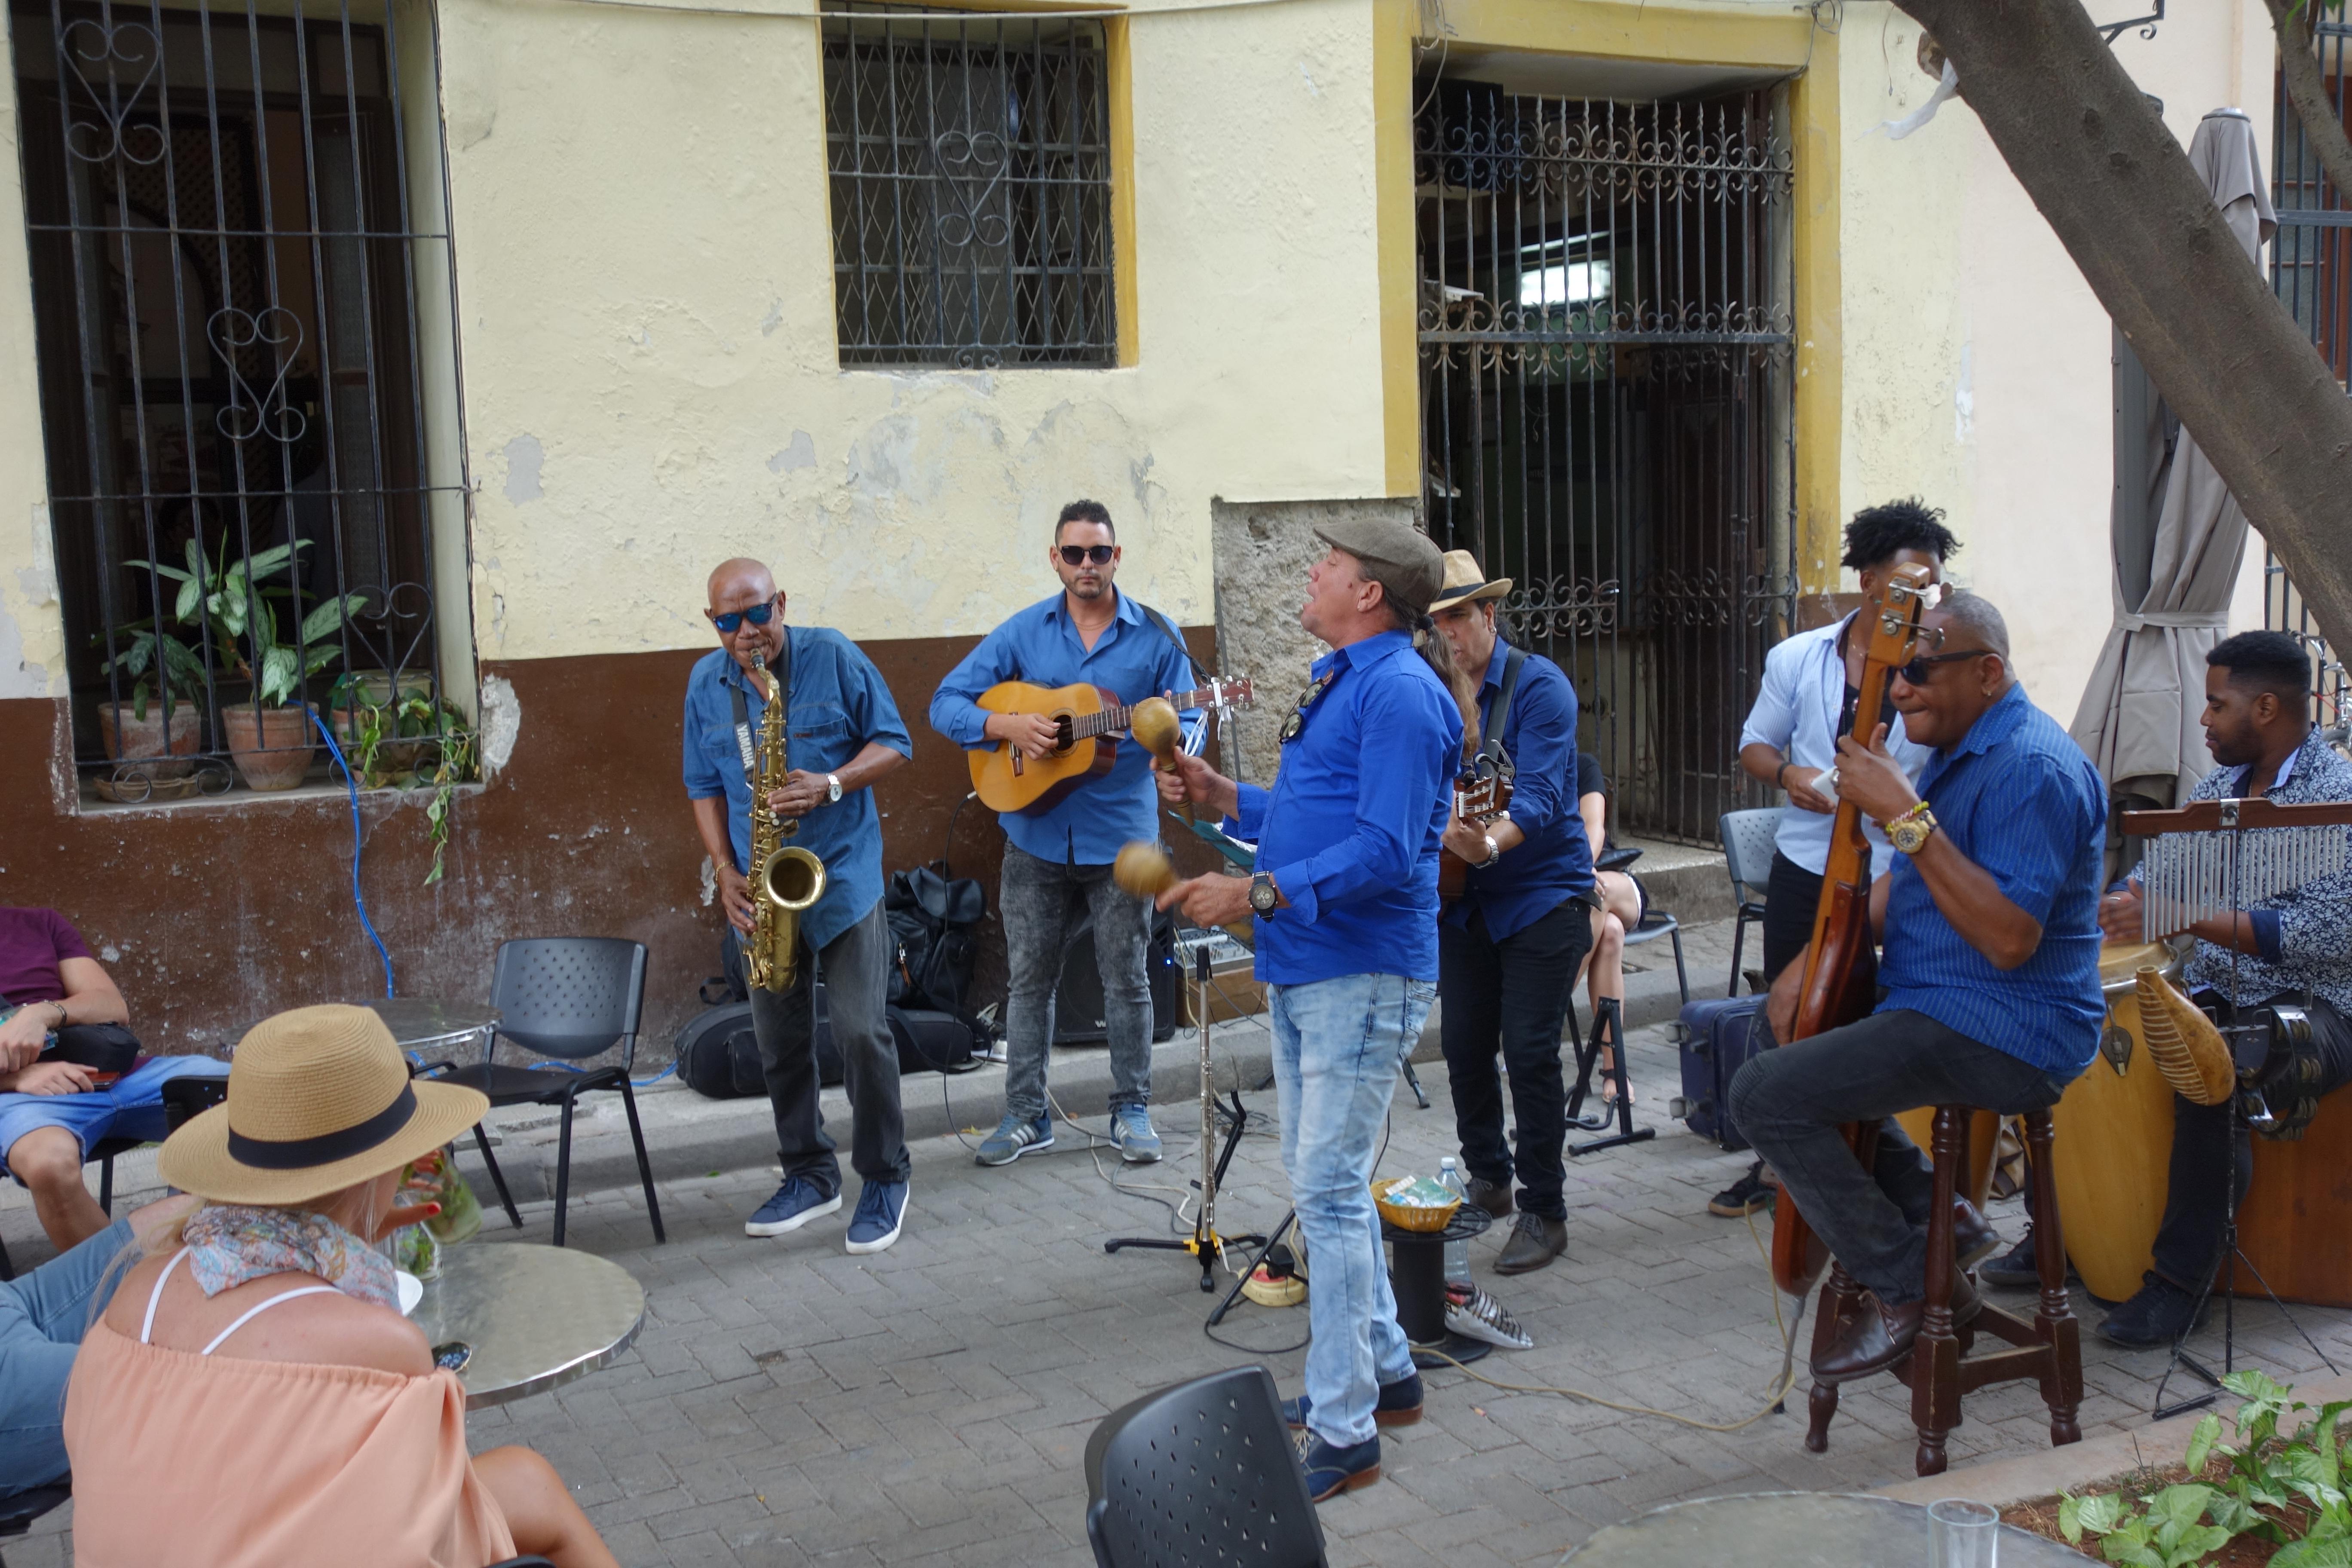 music-havana-cafe-de-paris